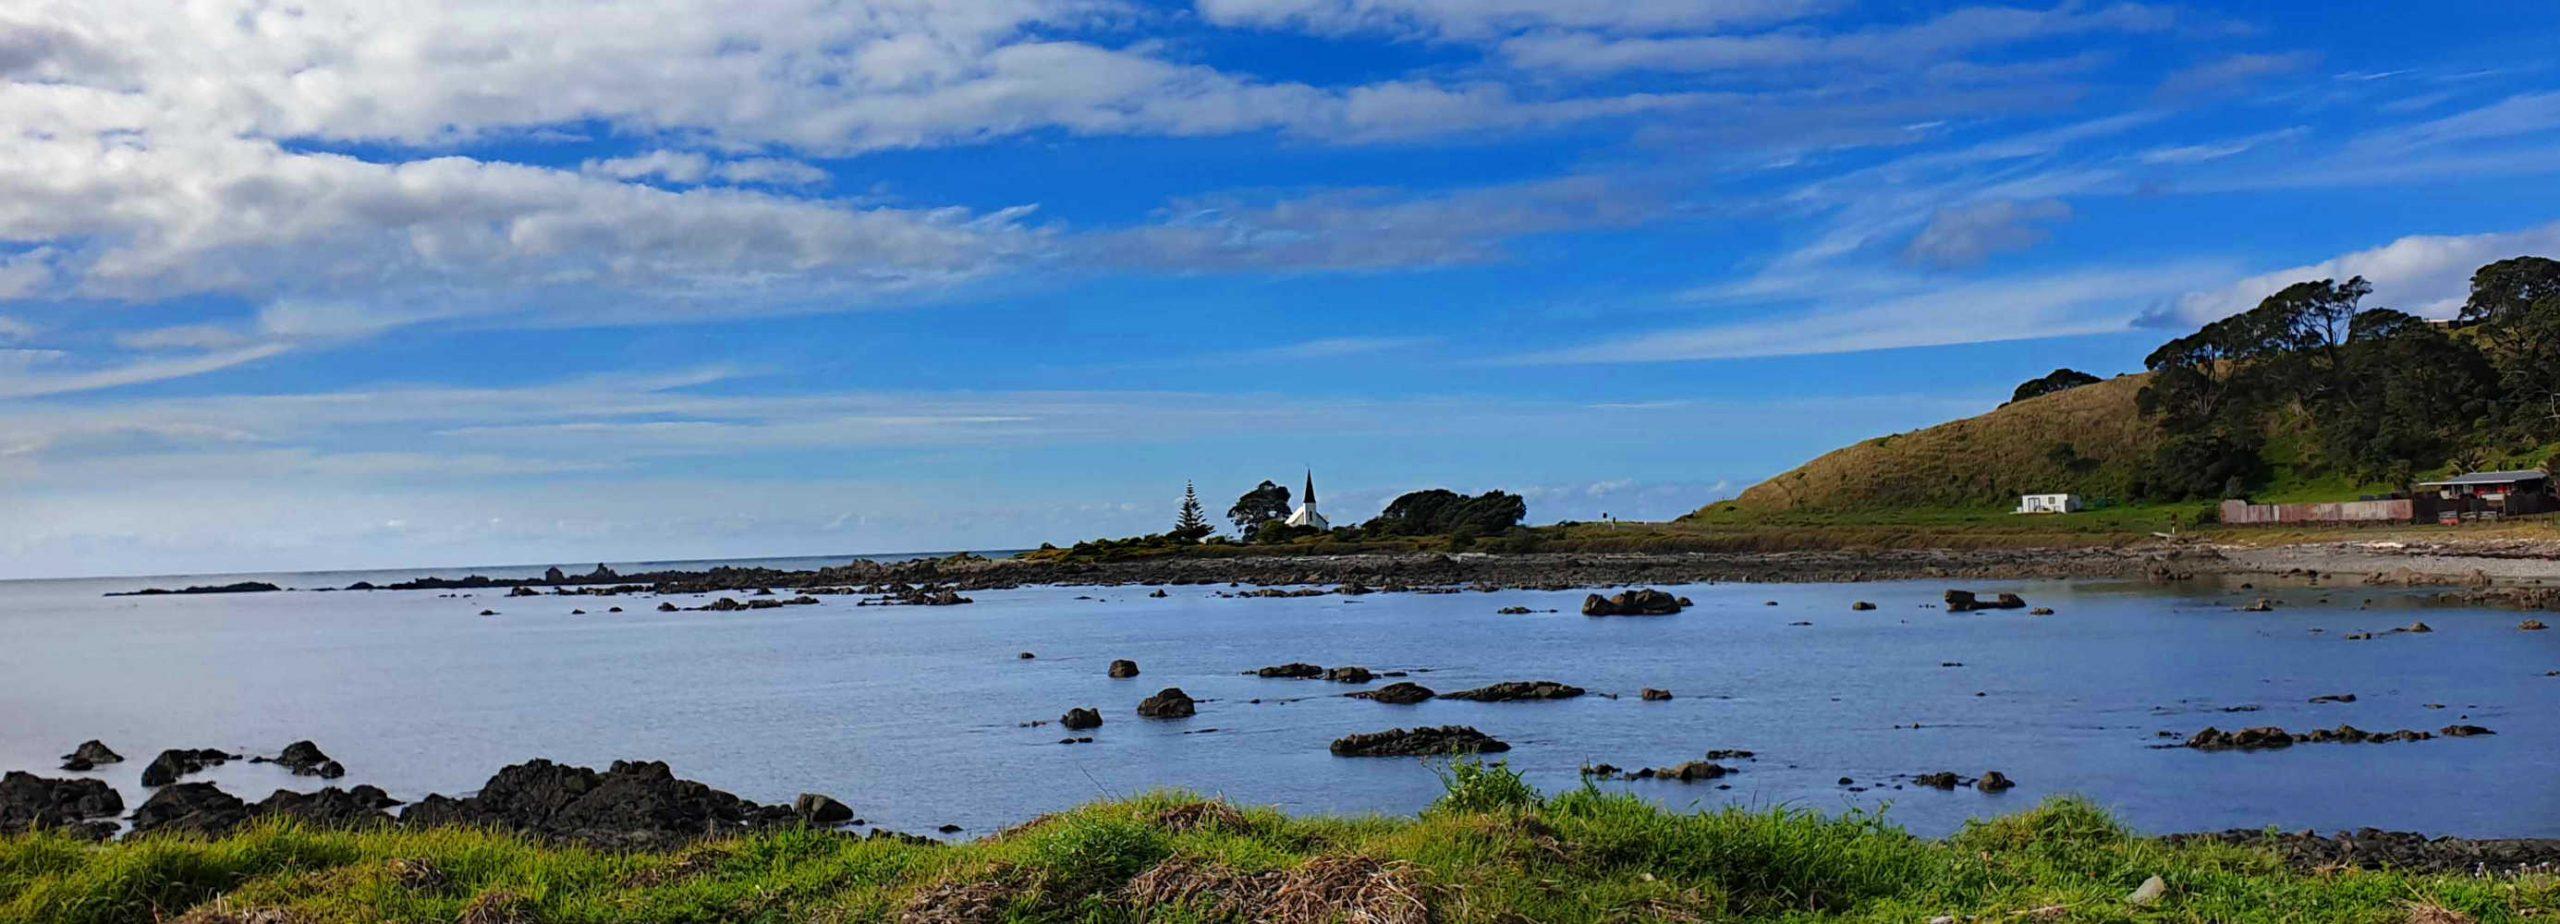 WAIHAU BAY view of iconic white spire of Anglician Raukokore Church,New Zealand